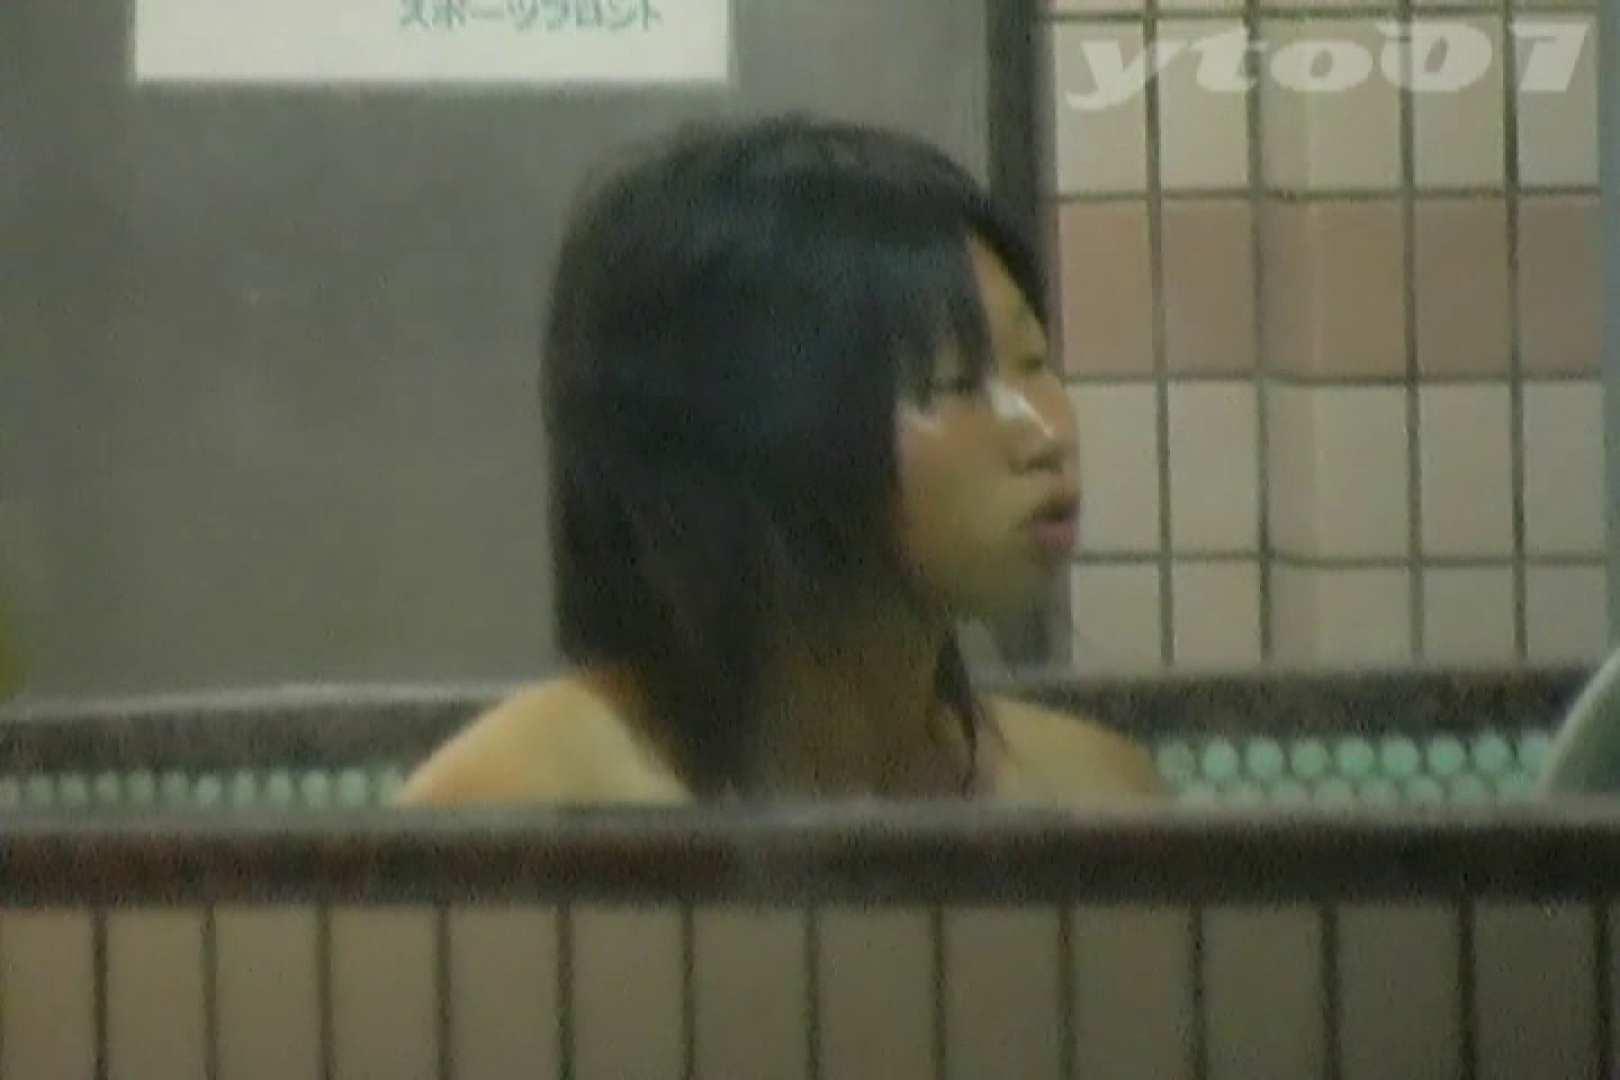 ▲復活限定▲合宿ホテル女風呂盗撮 Vol.07 0 | 0  92画像 48